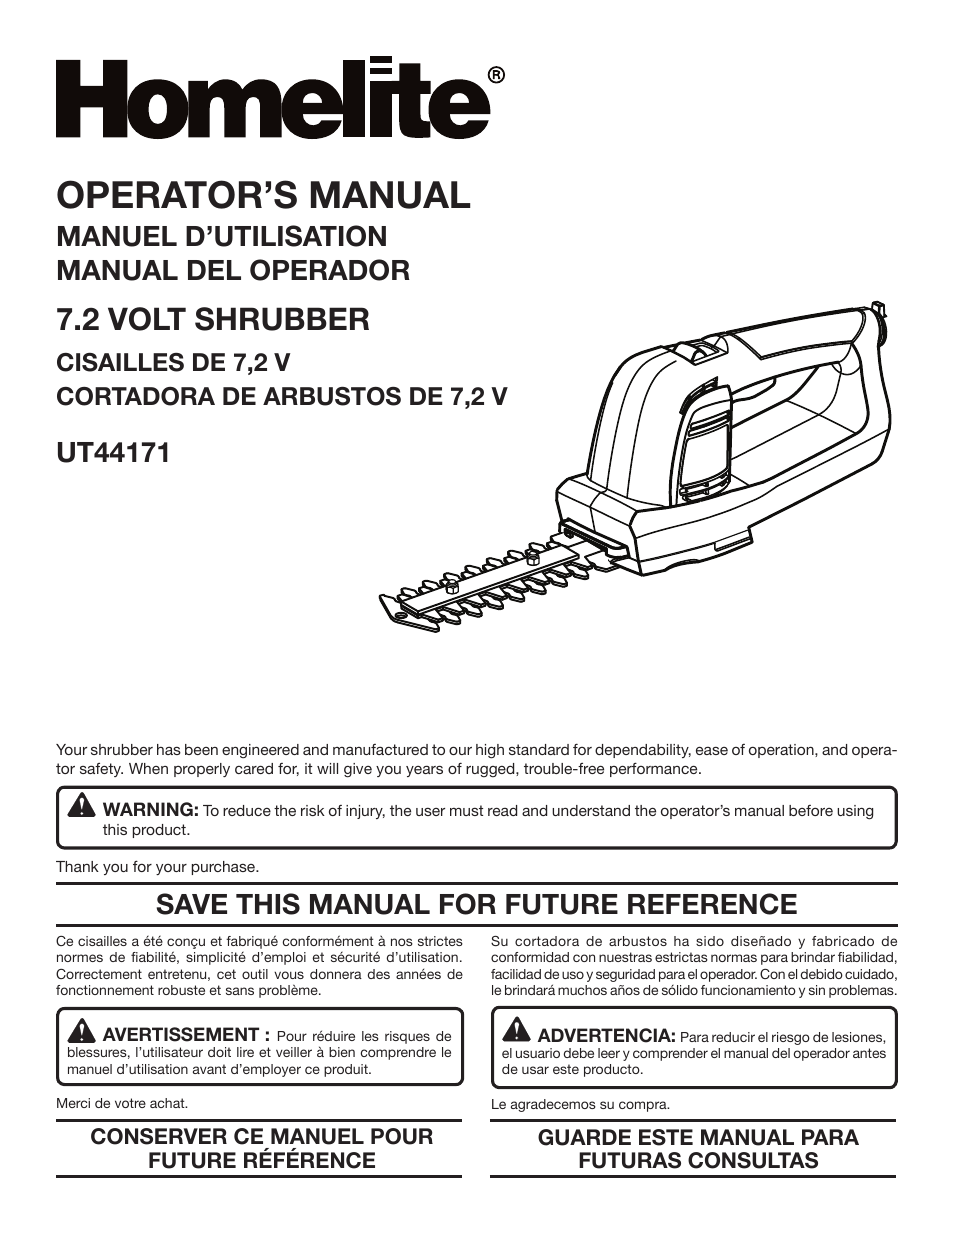 homelite ut44171 user manual 42 pages original mode rh manualsdir com Homelite Chainsaw Manual PDF Homelite String Trimmer Manual